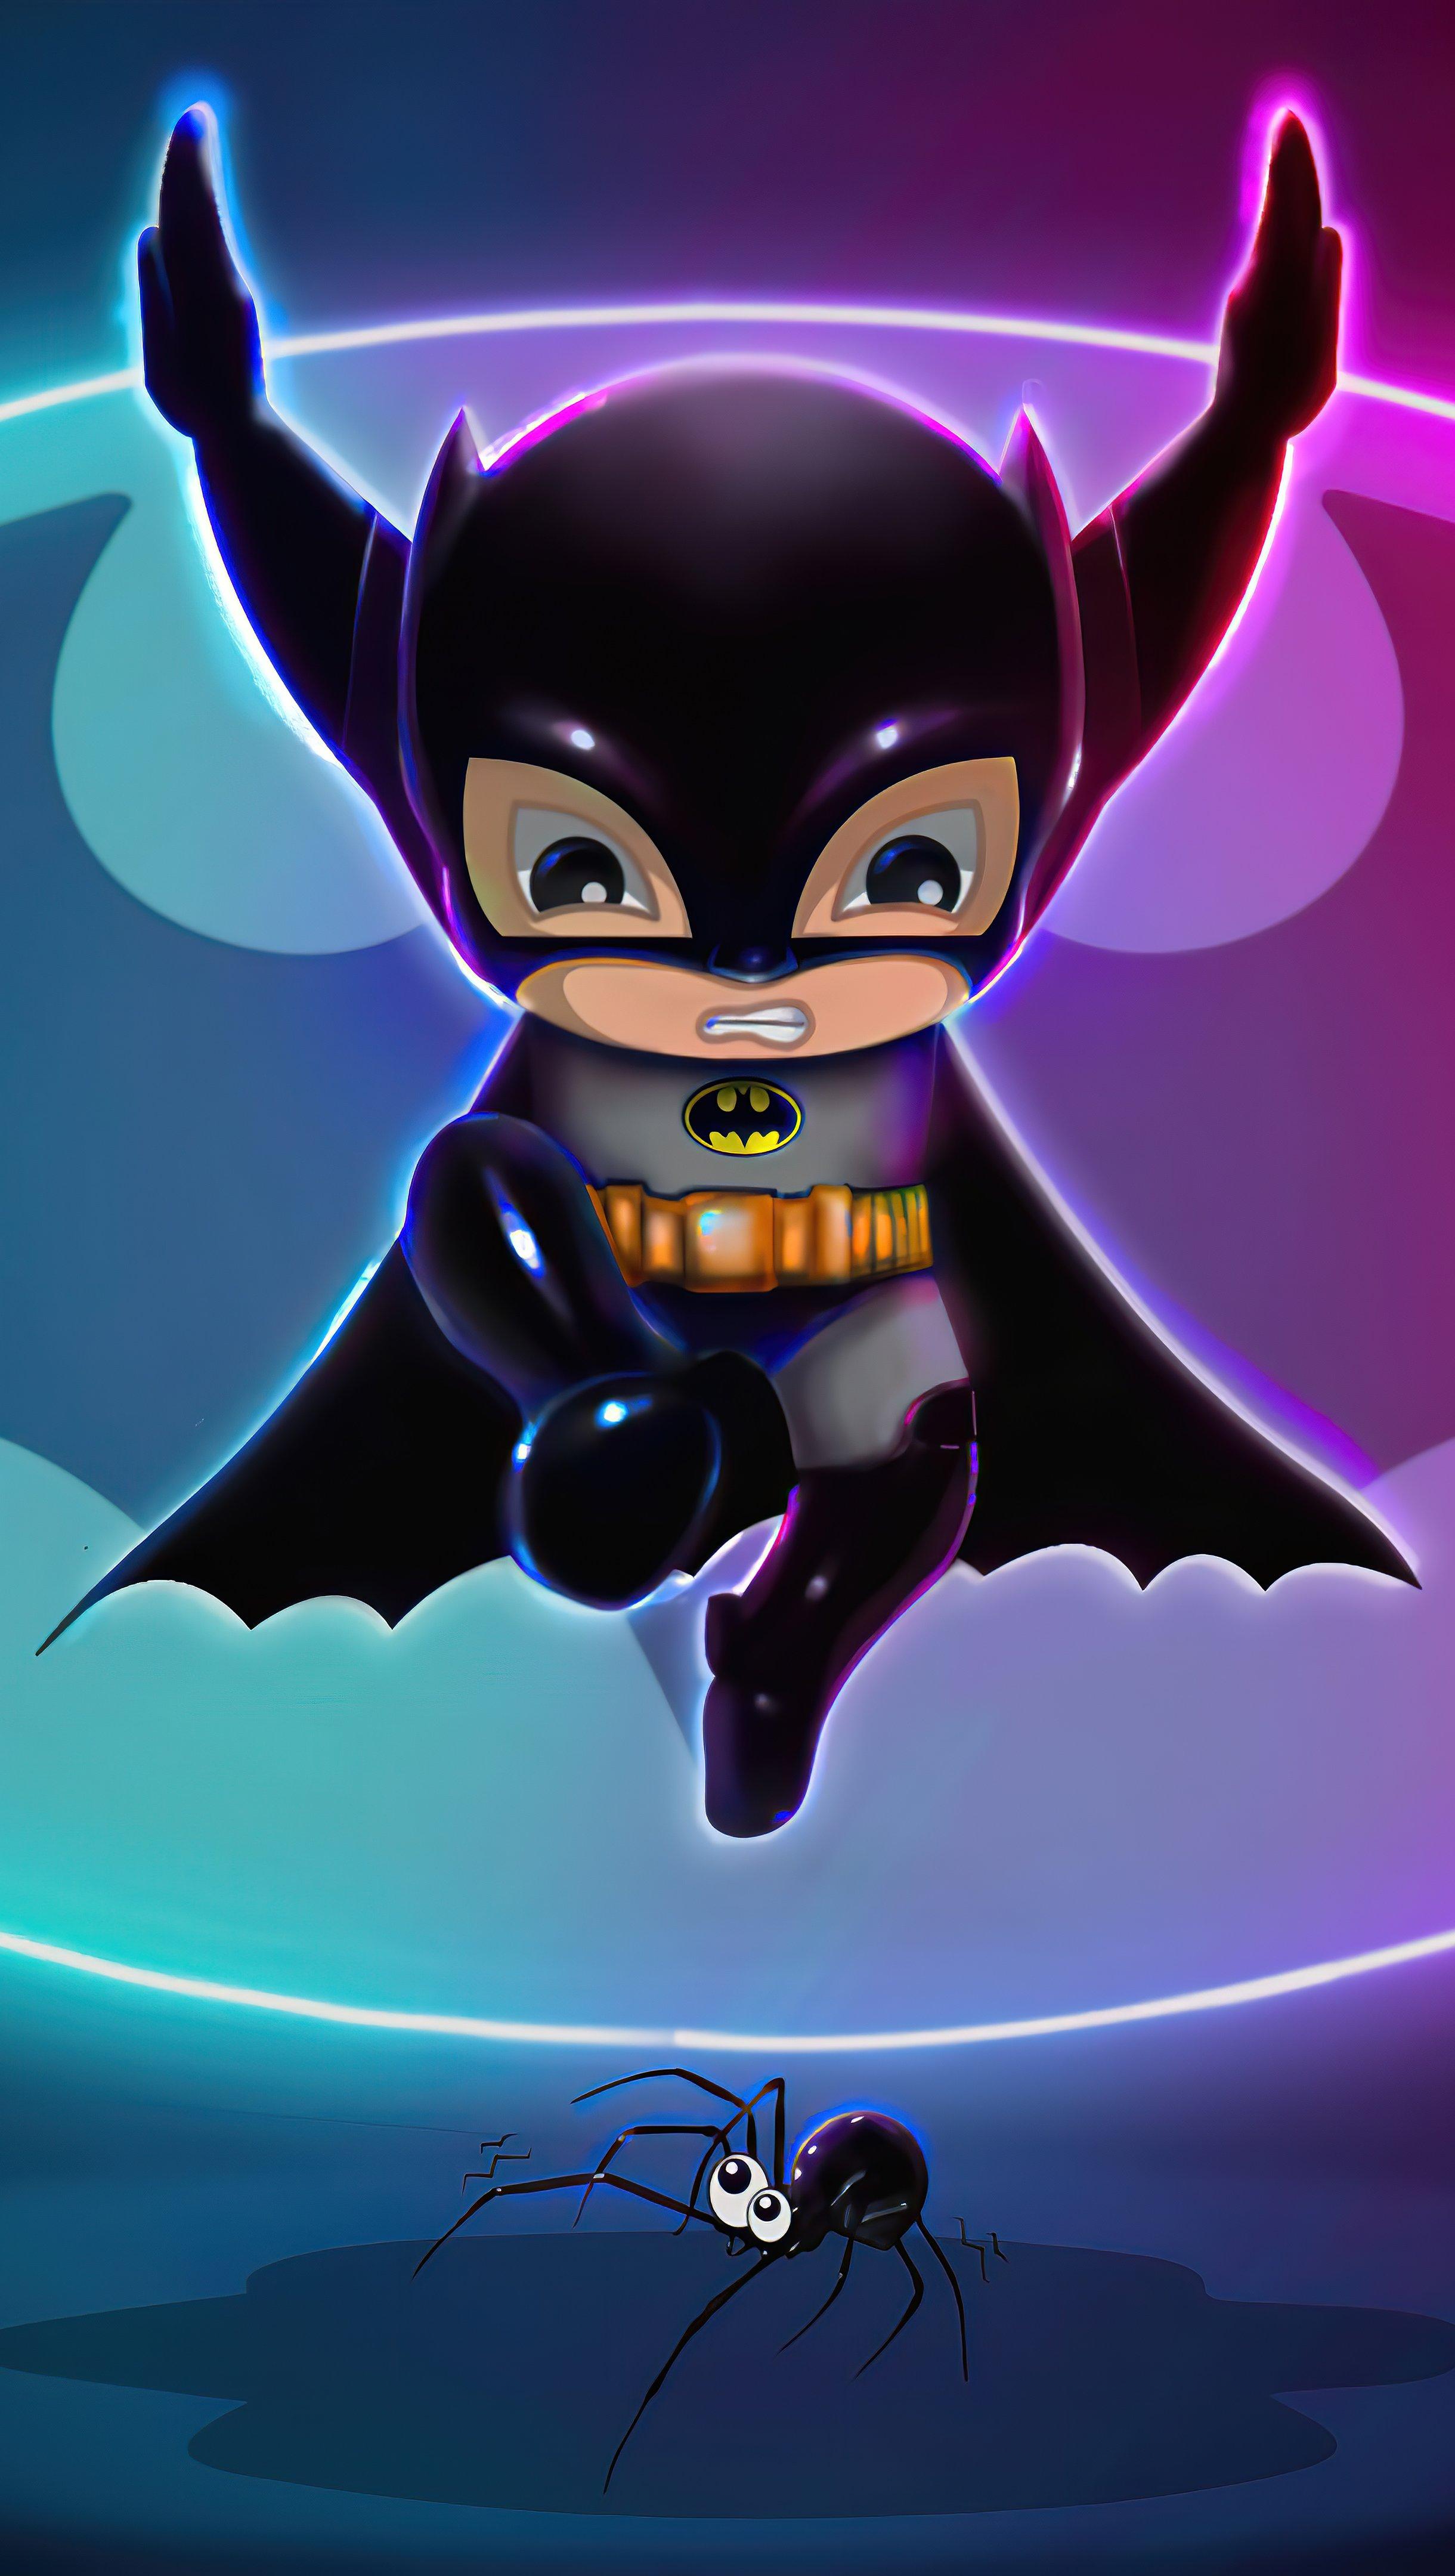 Wallpaper Batman illustration with neon lights Vertical